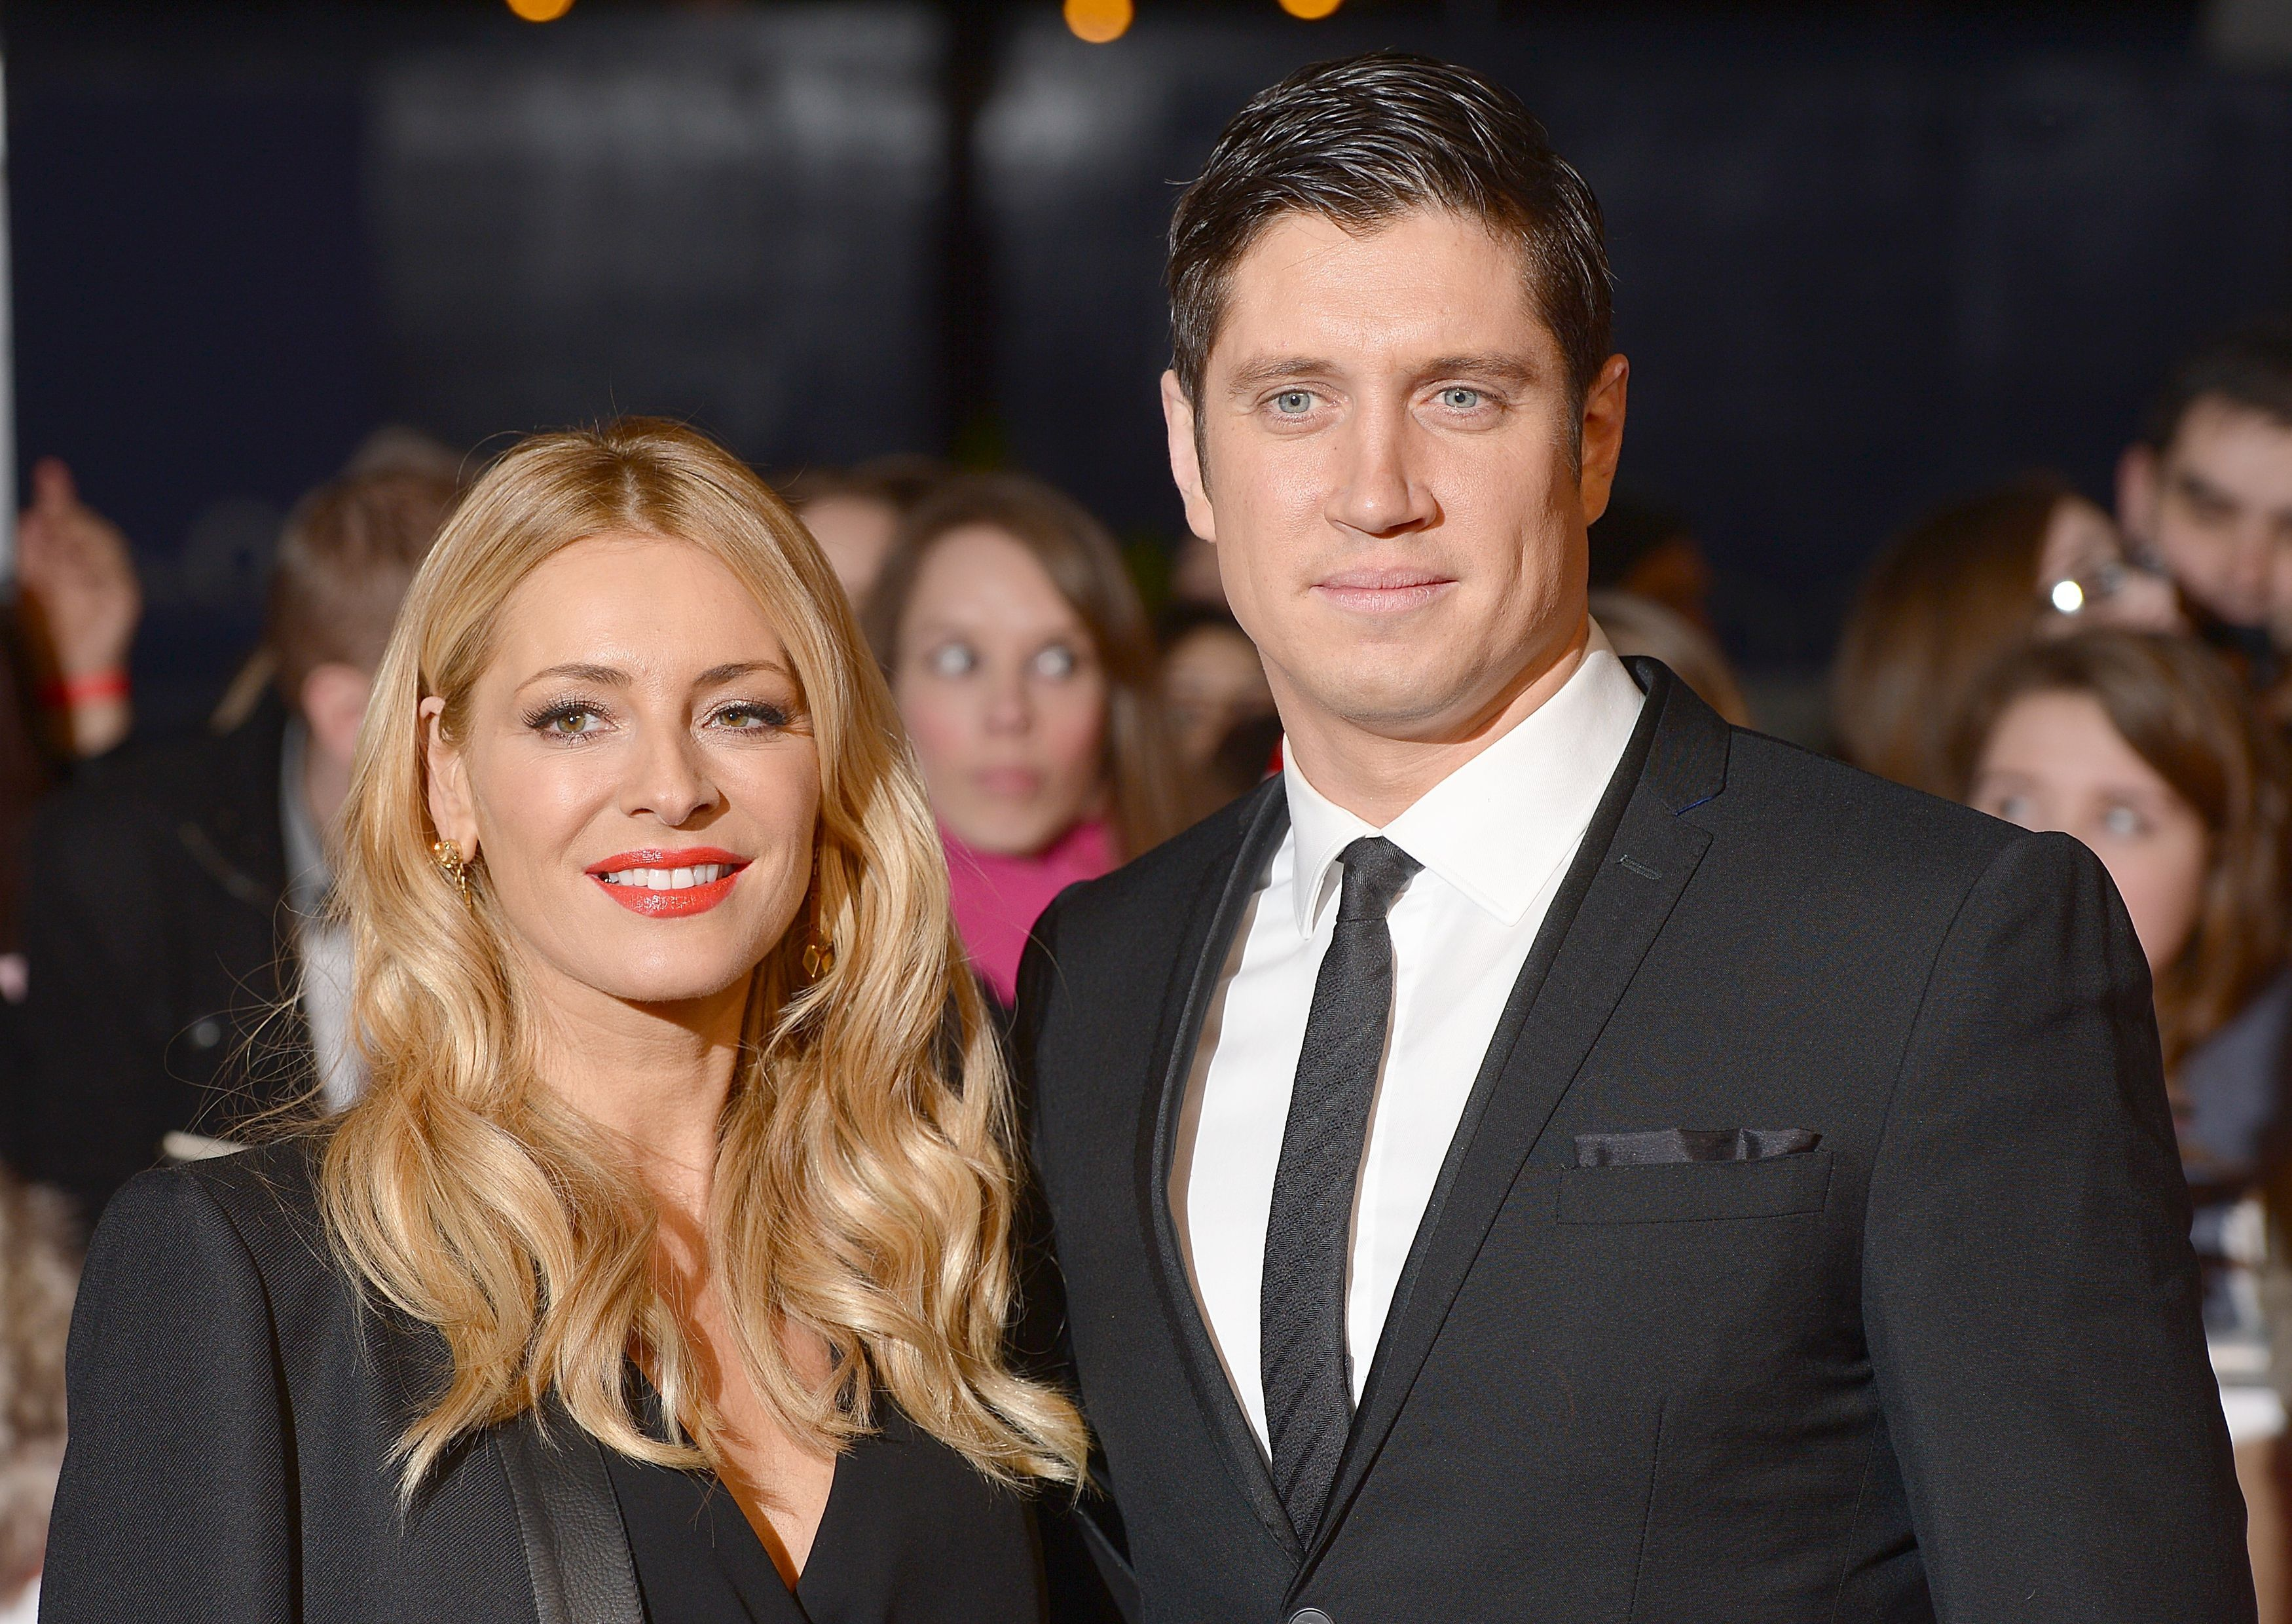 Vernon Kay and Tess Daly take 'make or break' holiday following Rhian Sugden text scandal